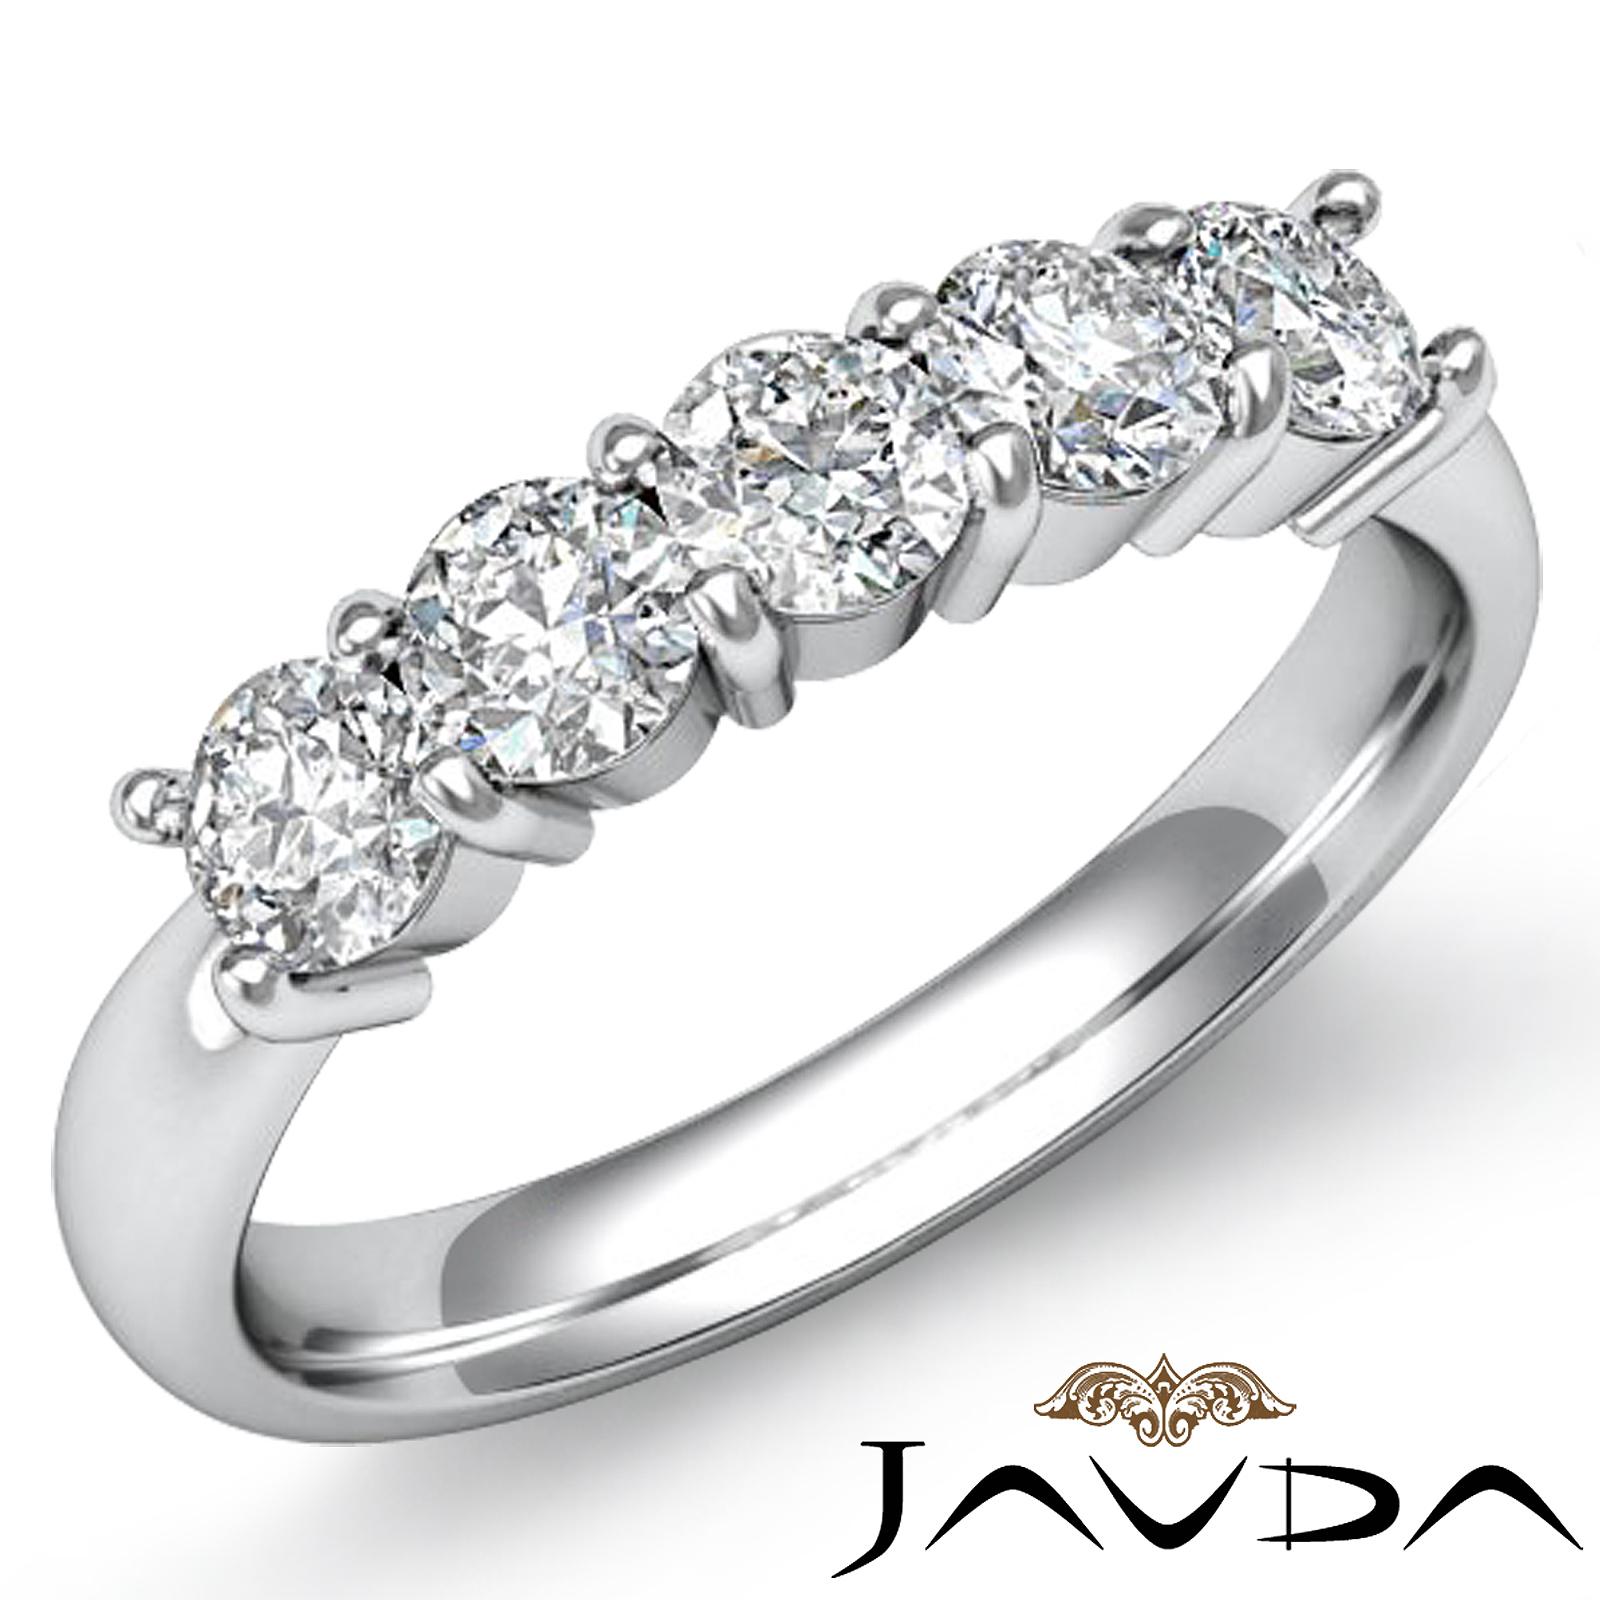 stone round prong diamond women 39 s half wedding band 14k white gold